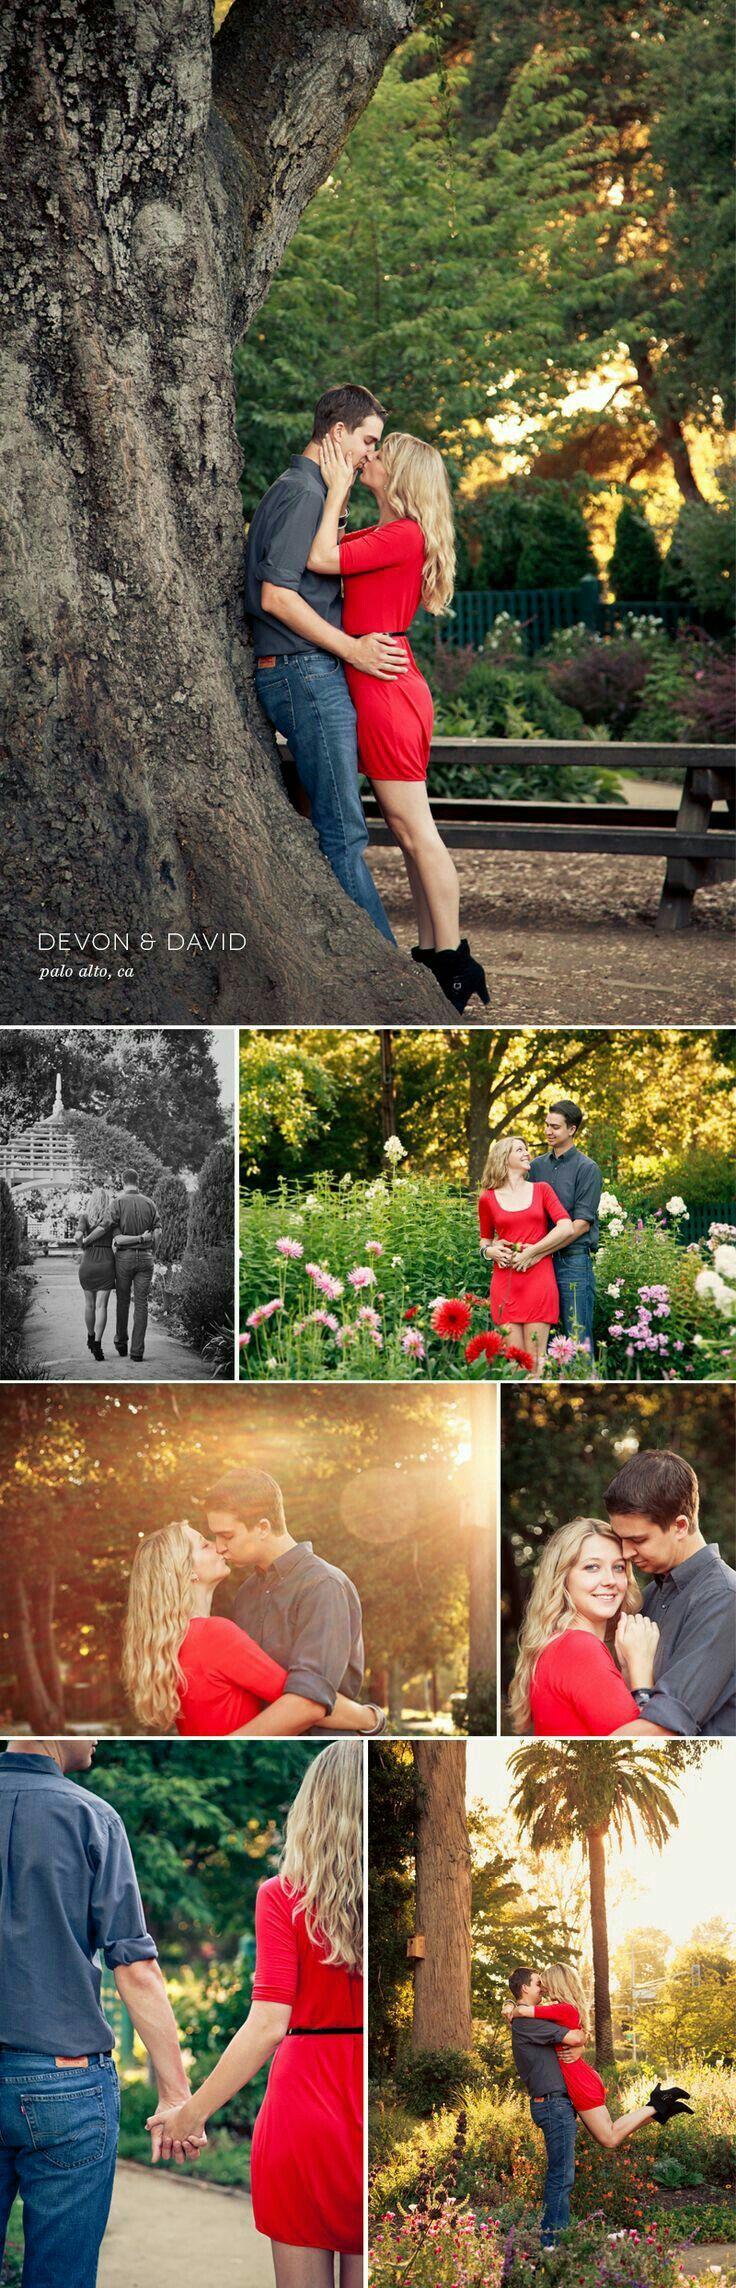 Photograph session wedding album